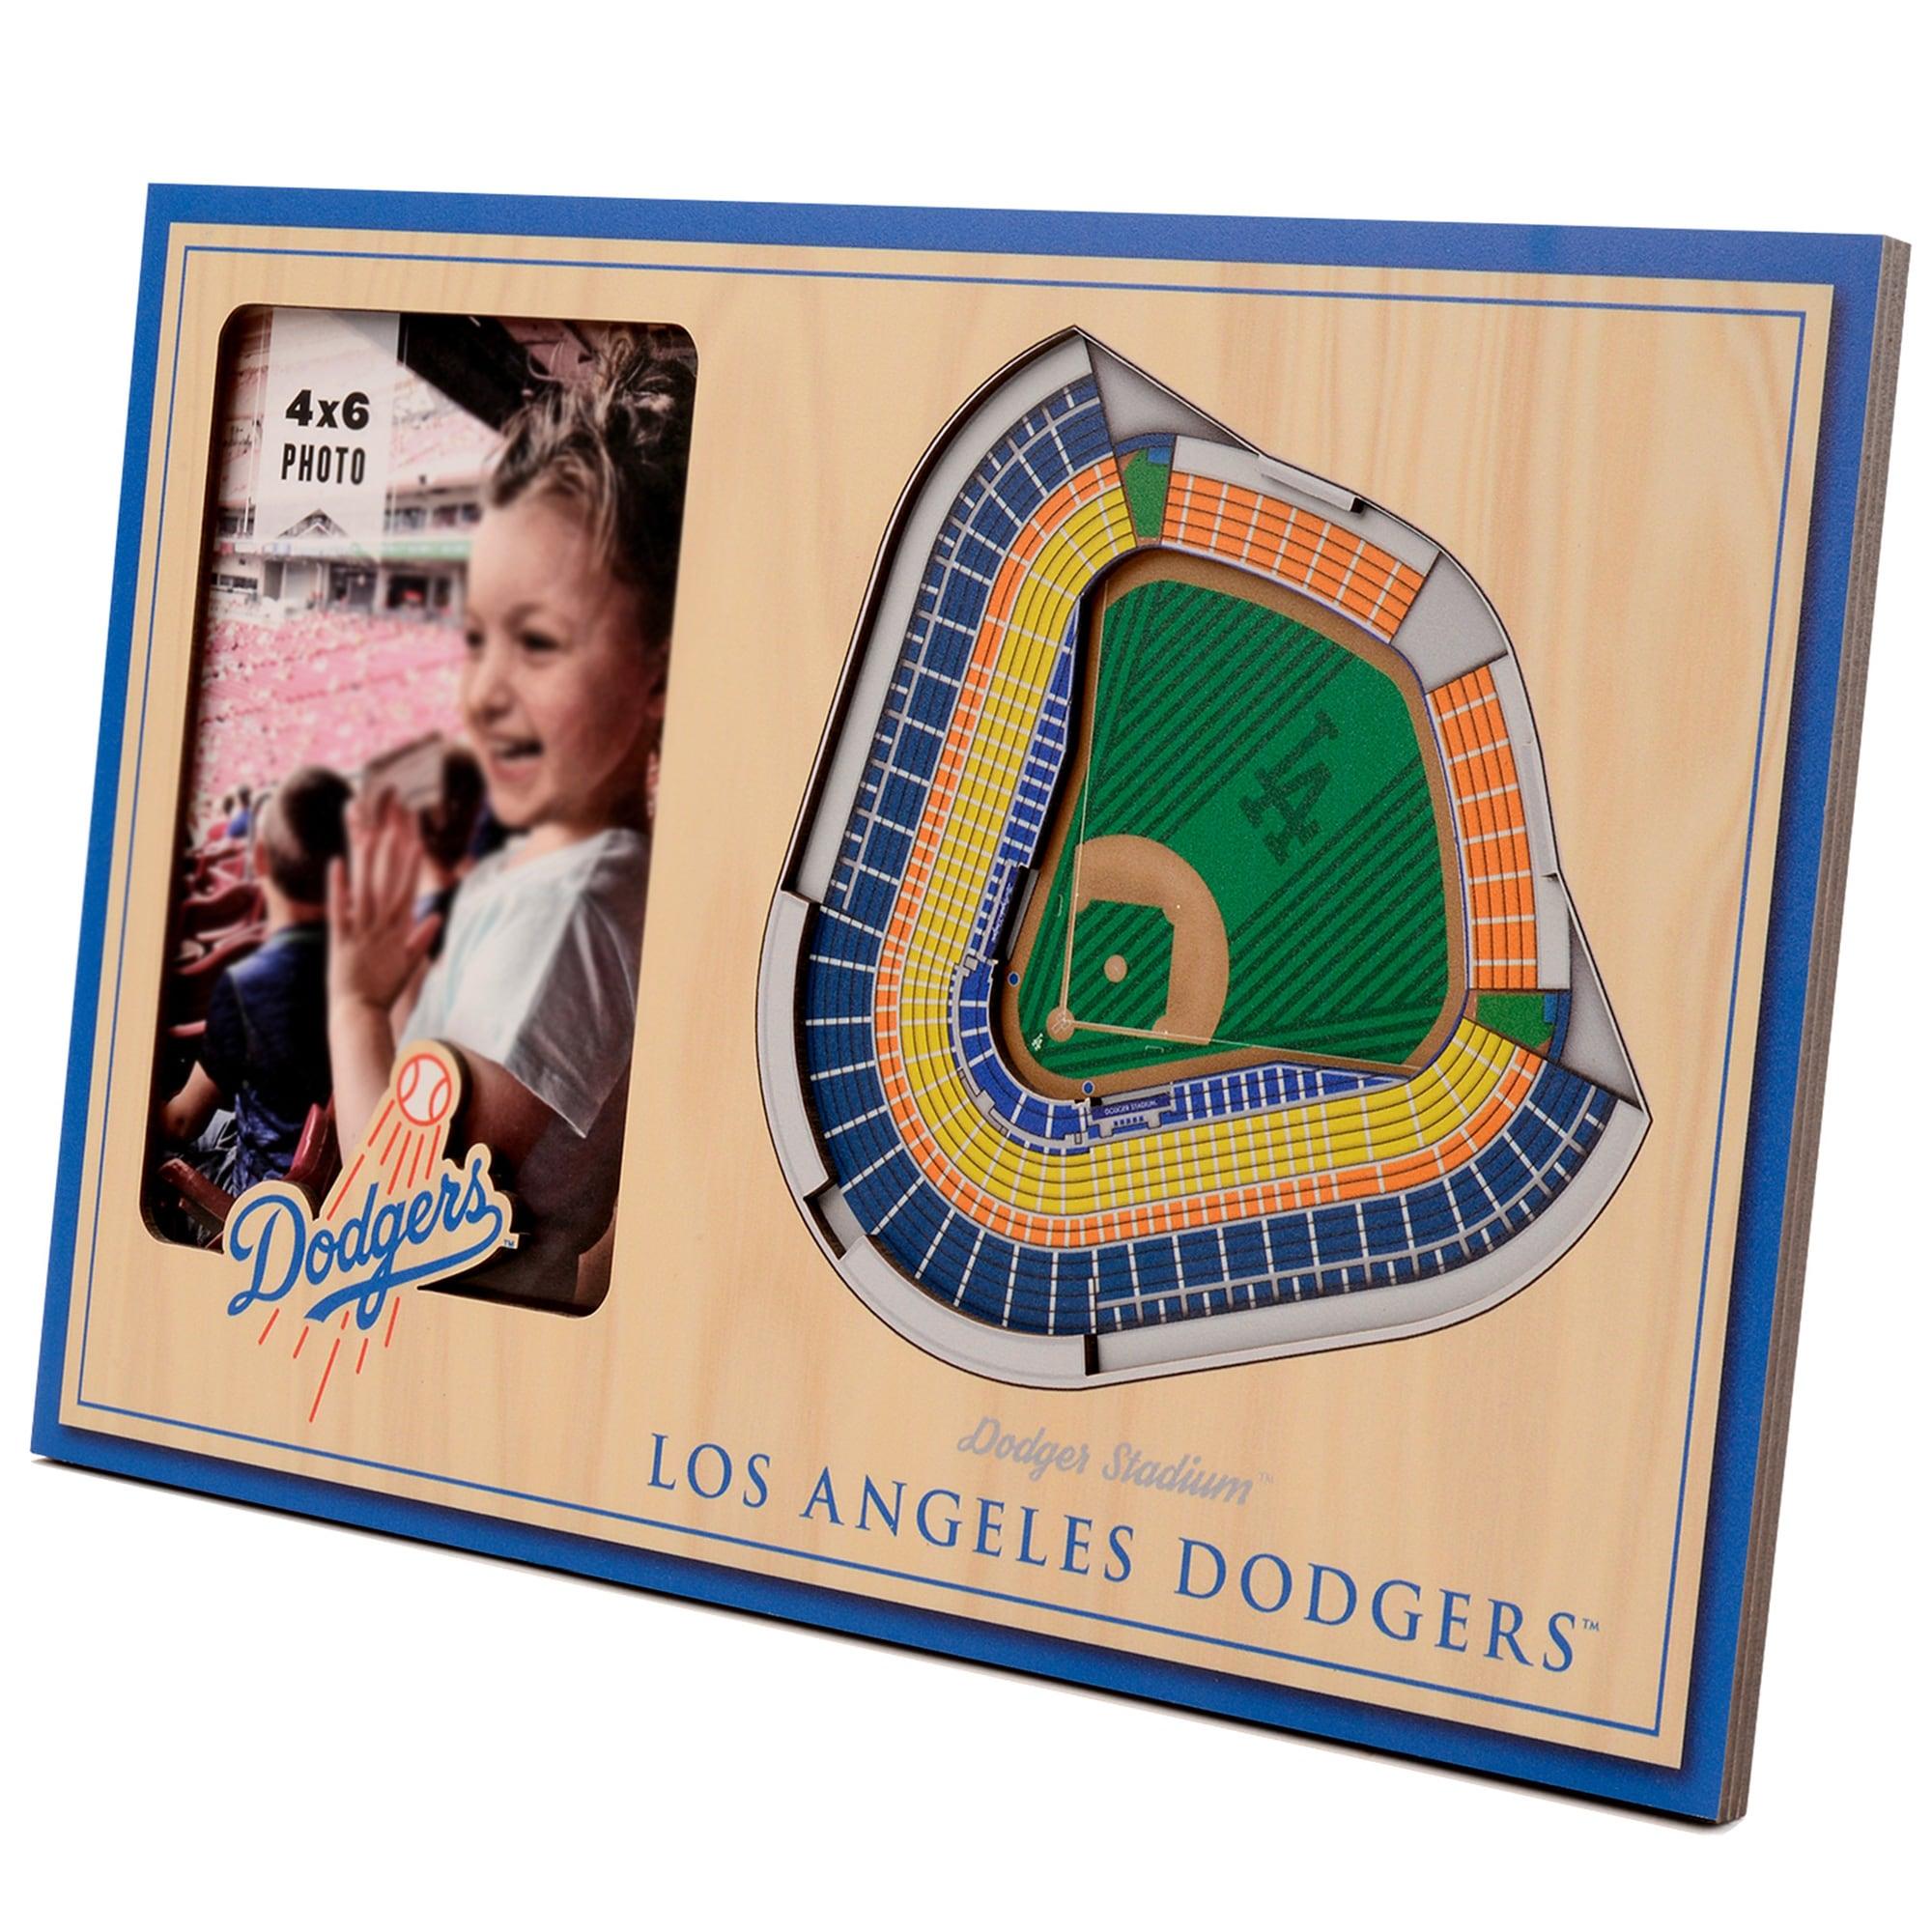 Los Angeles Dodgers 3D StadiumViews Picture Frame - Brown